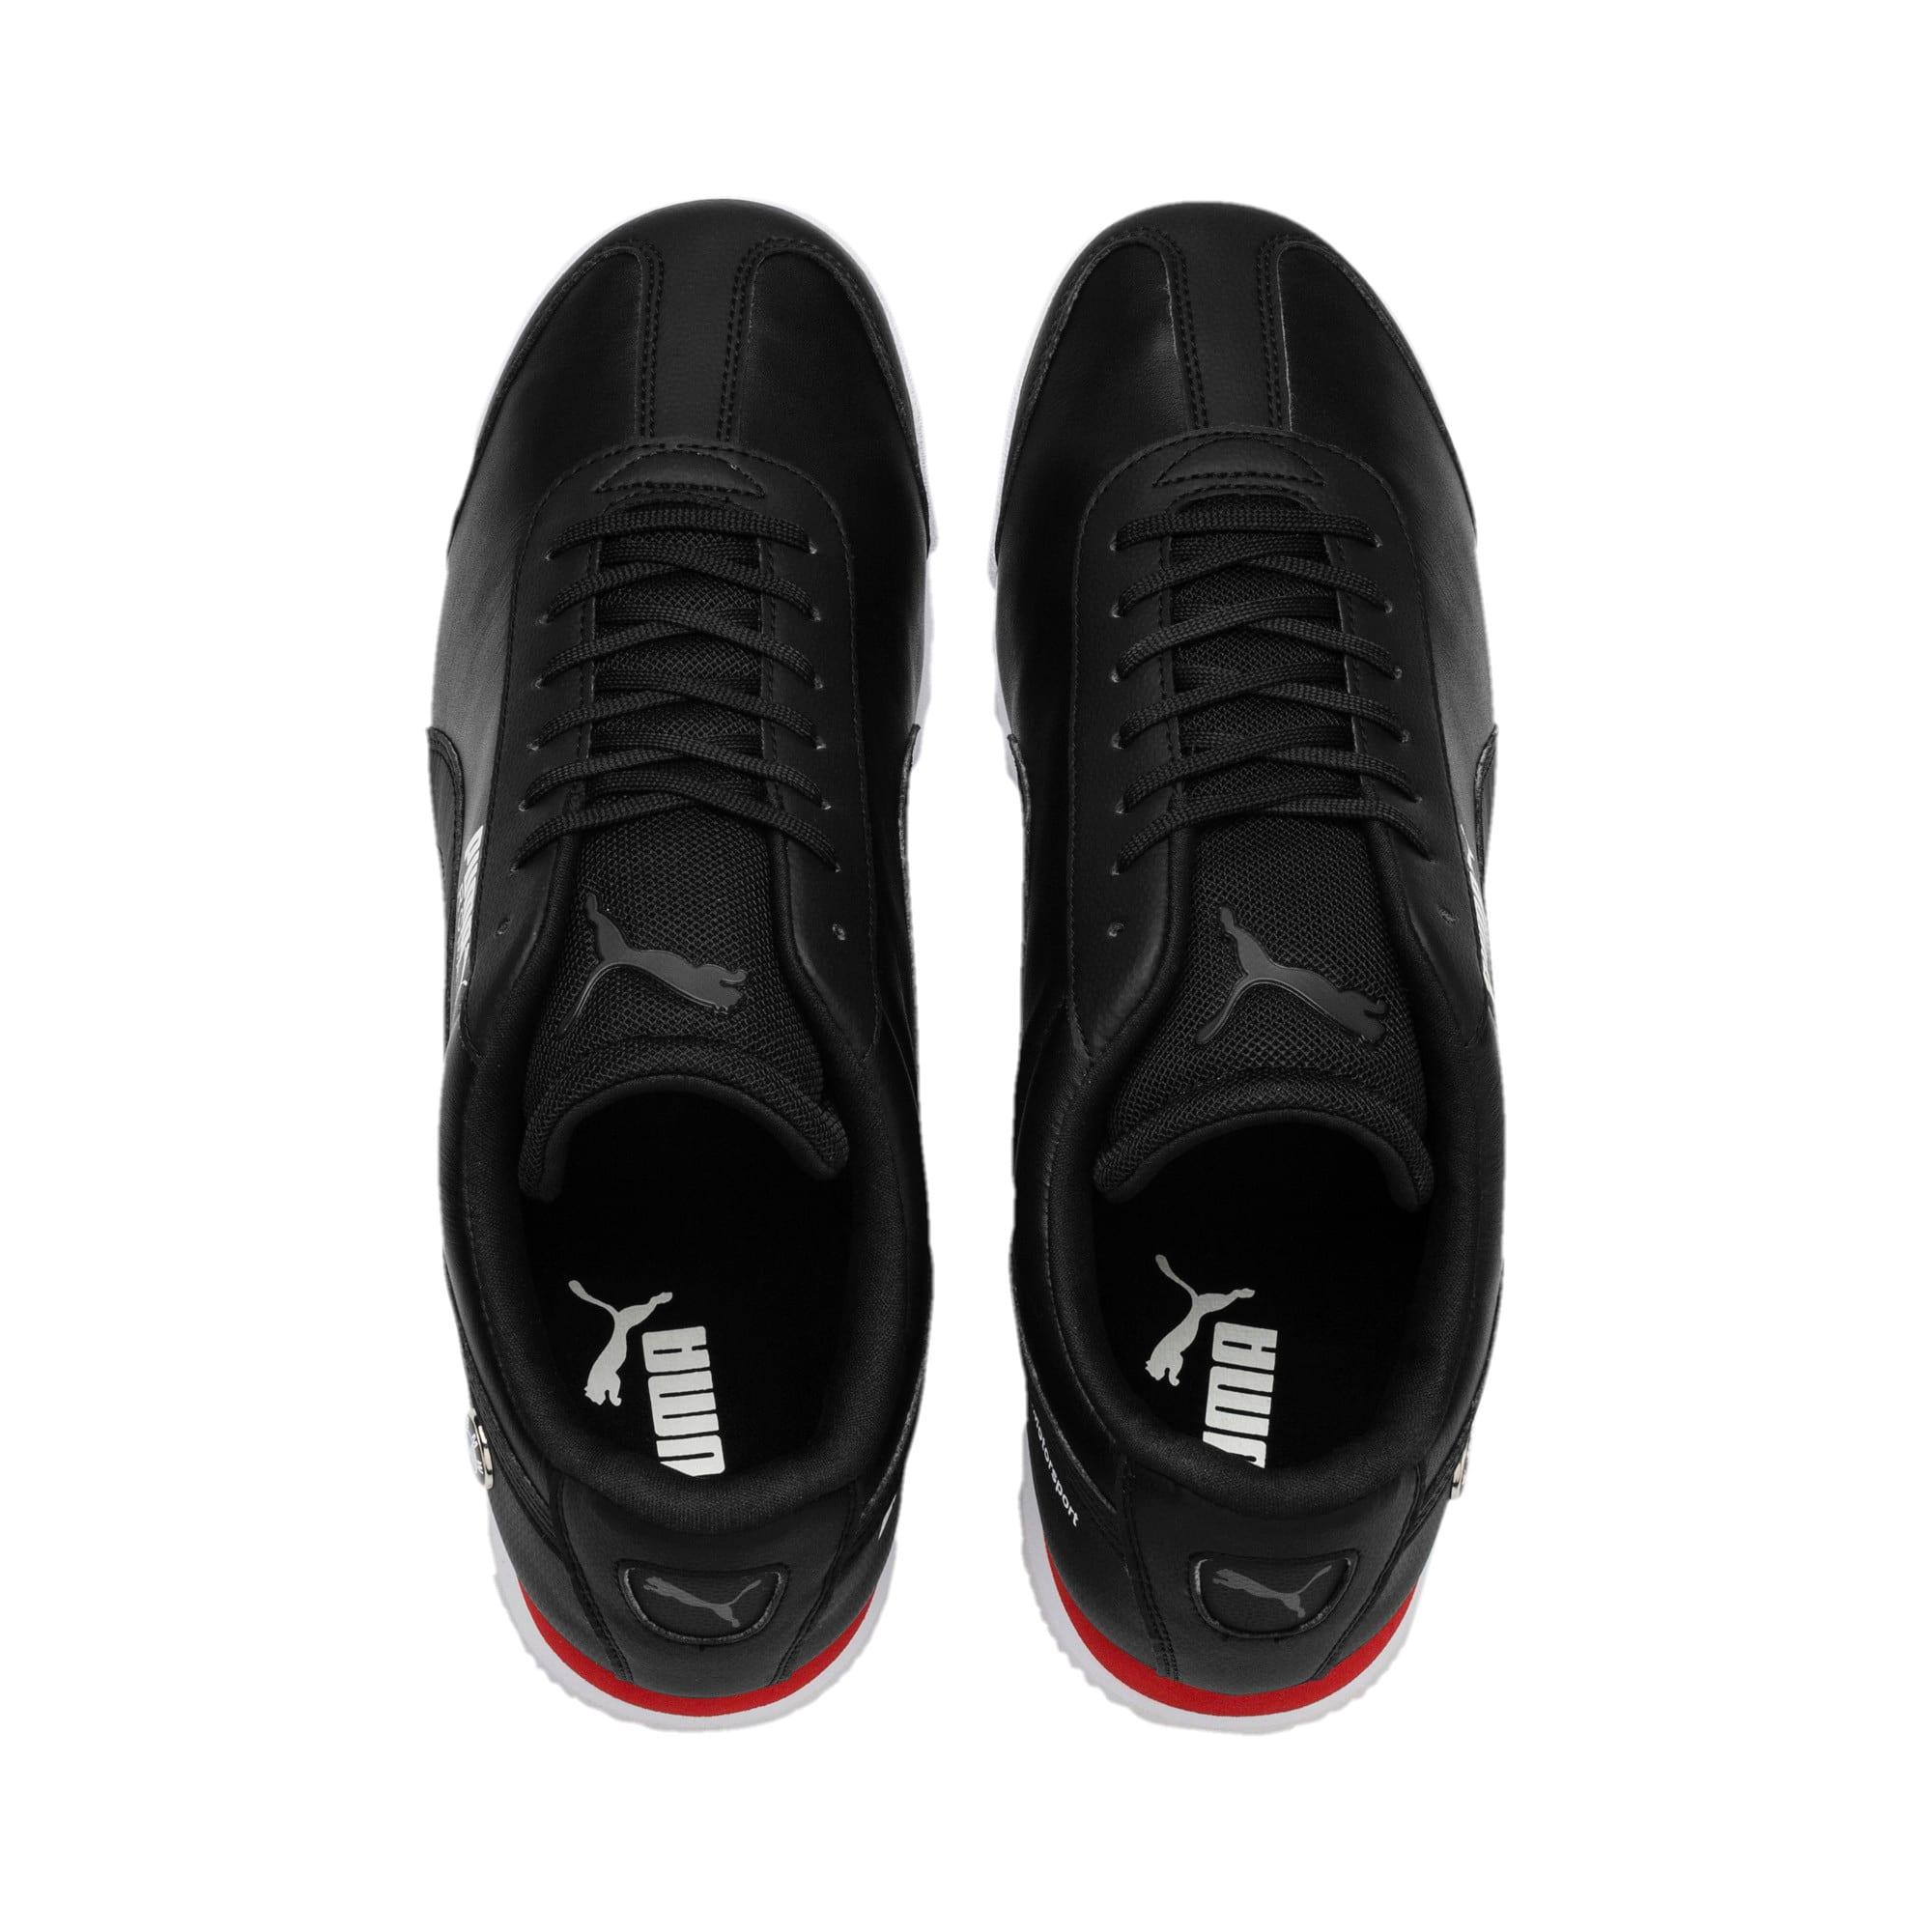 Thumbnail 6 of BMW MMS Roma sneakers voor heren, Puma Black-Puma Black, medium